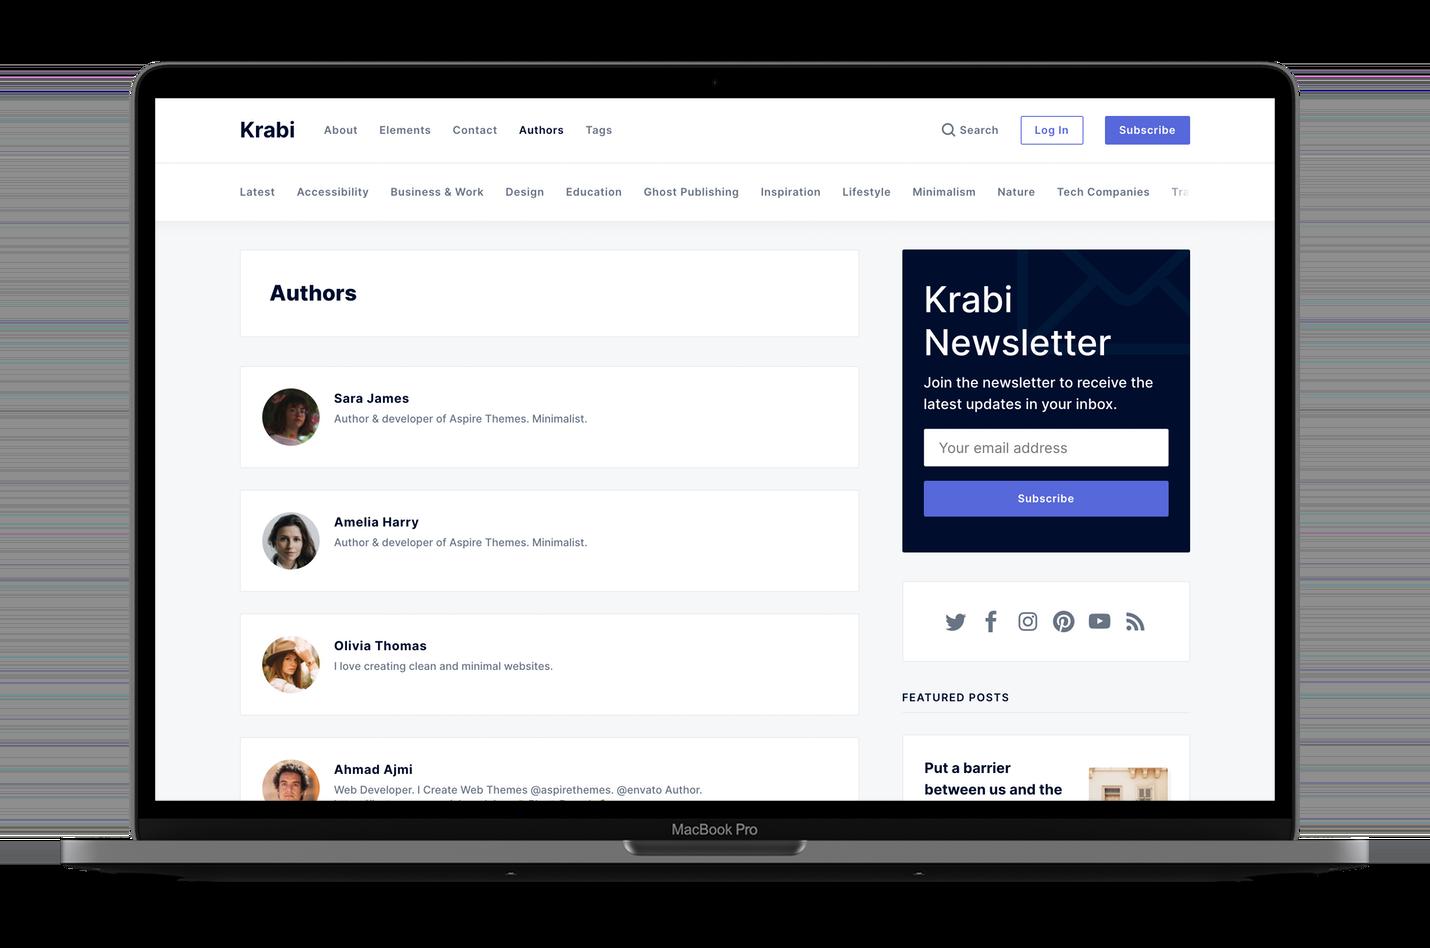 Krabi Authors Page